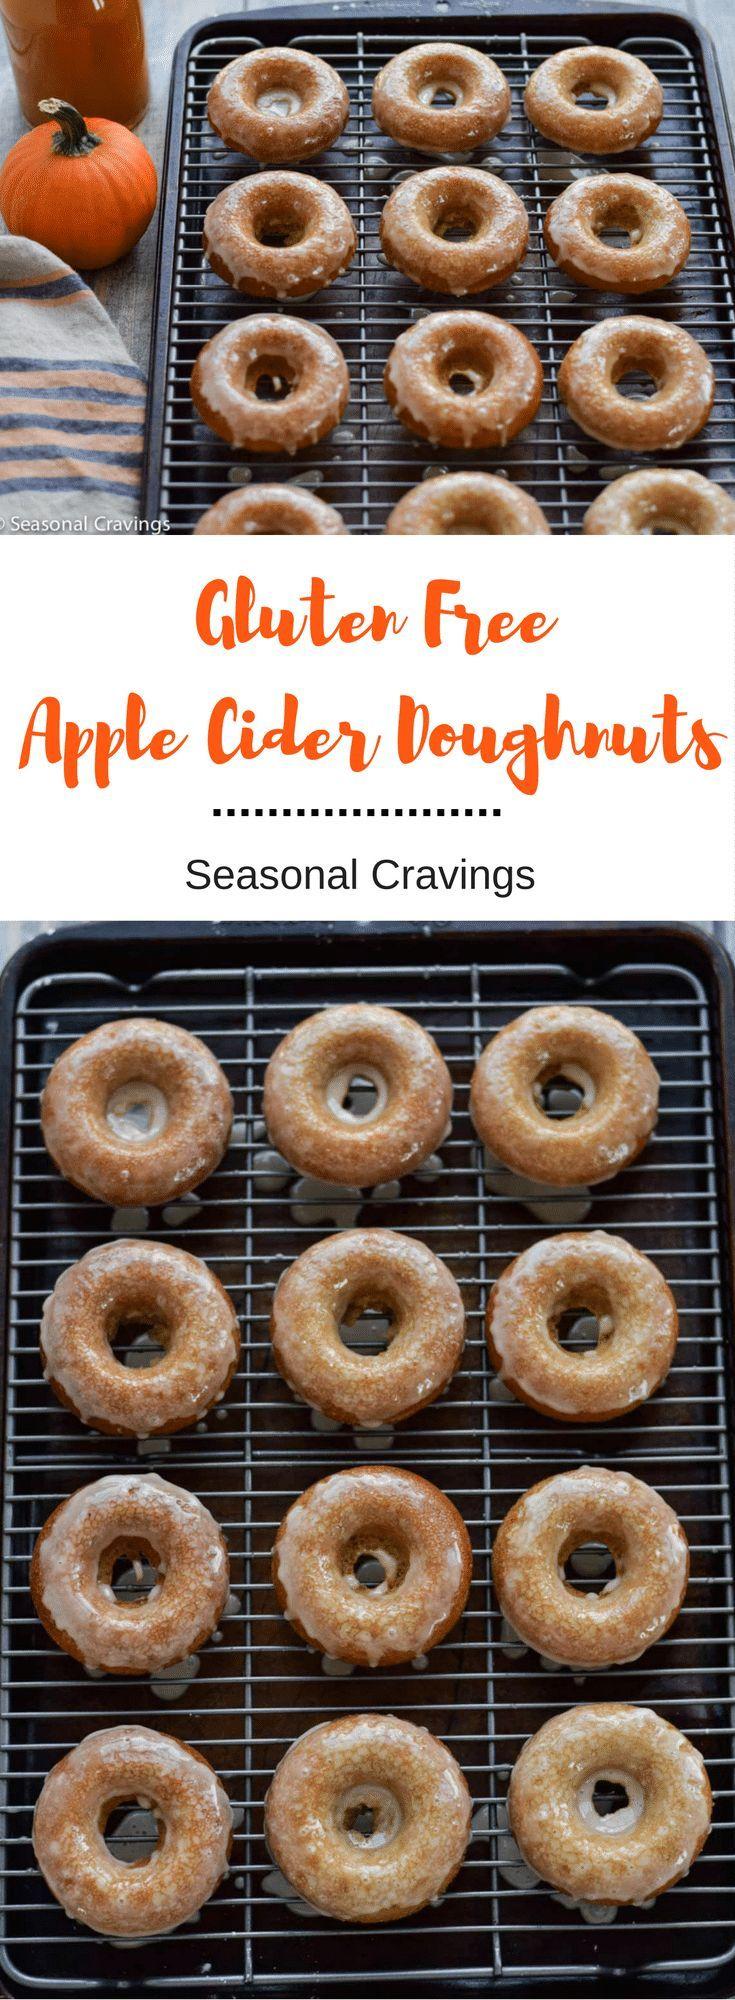 Gluten Free Apple Cider Doughnuts Recipe Gluten free